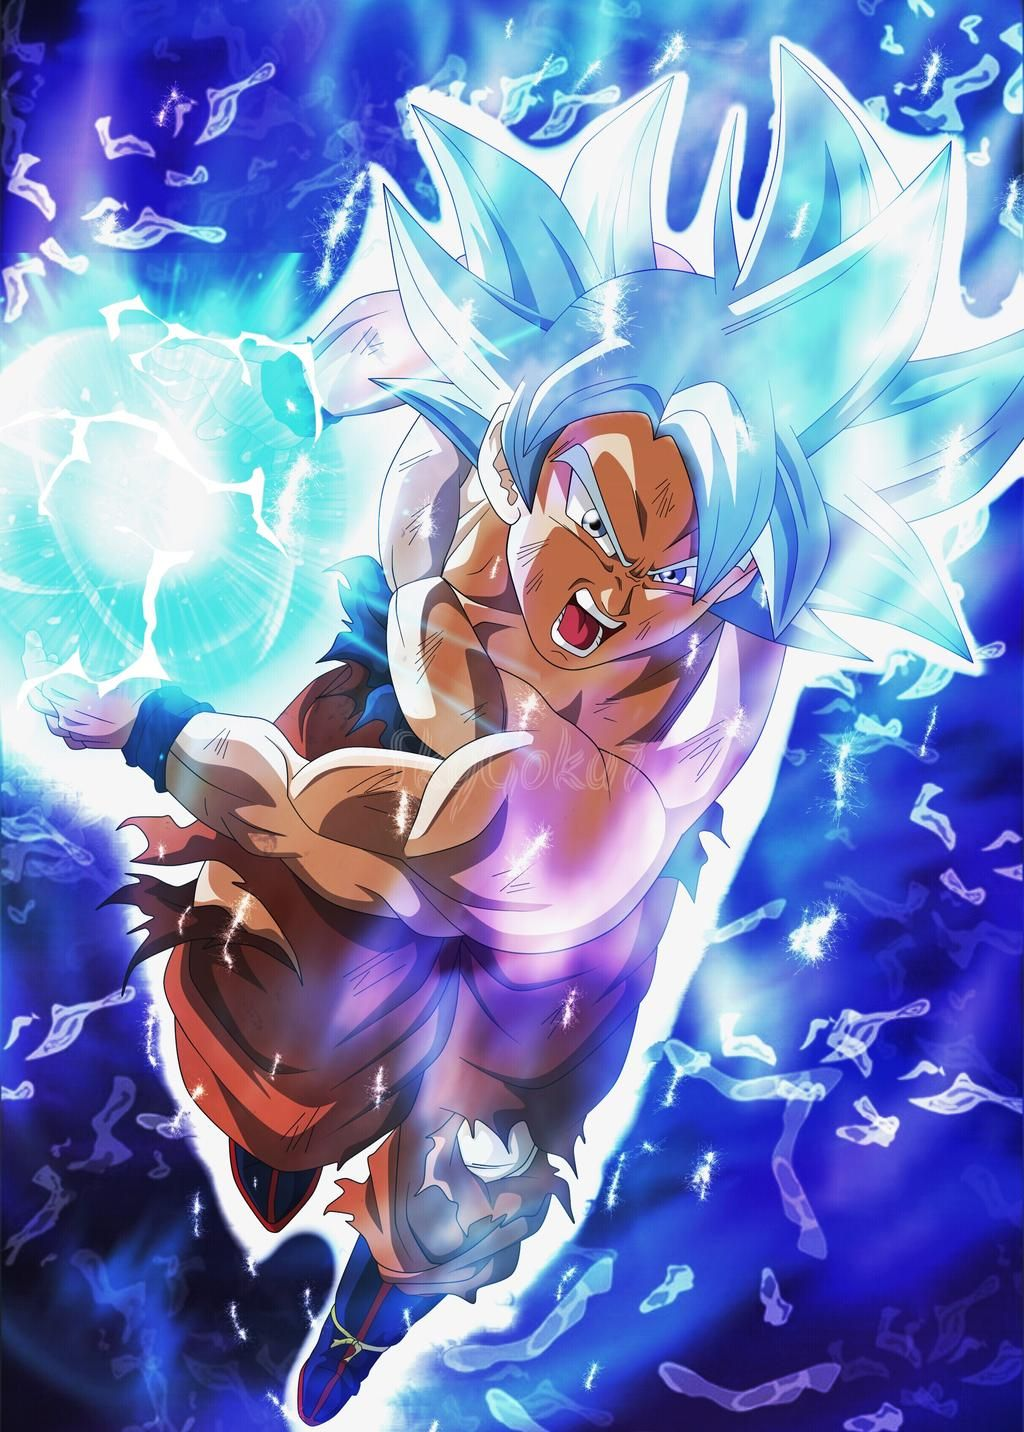 Ultra Instinct Goku Kamehameha By Skygoku7 Dragon Ball Super Artwork Dragon Ball Super Goku Anime Dragon Ball Super